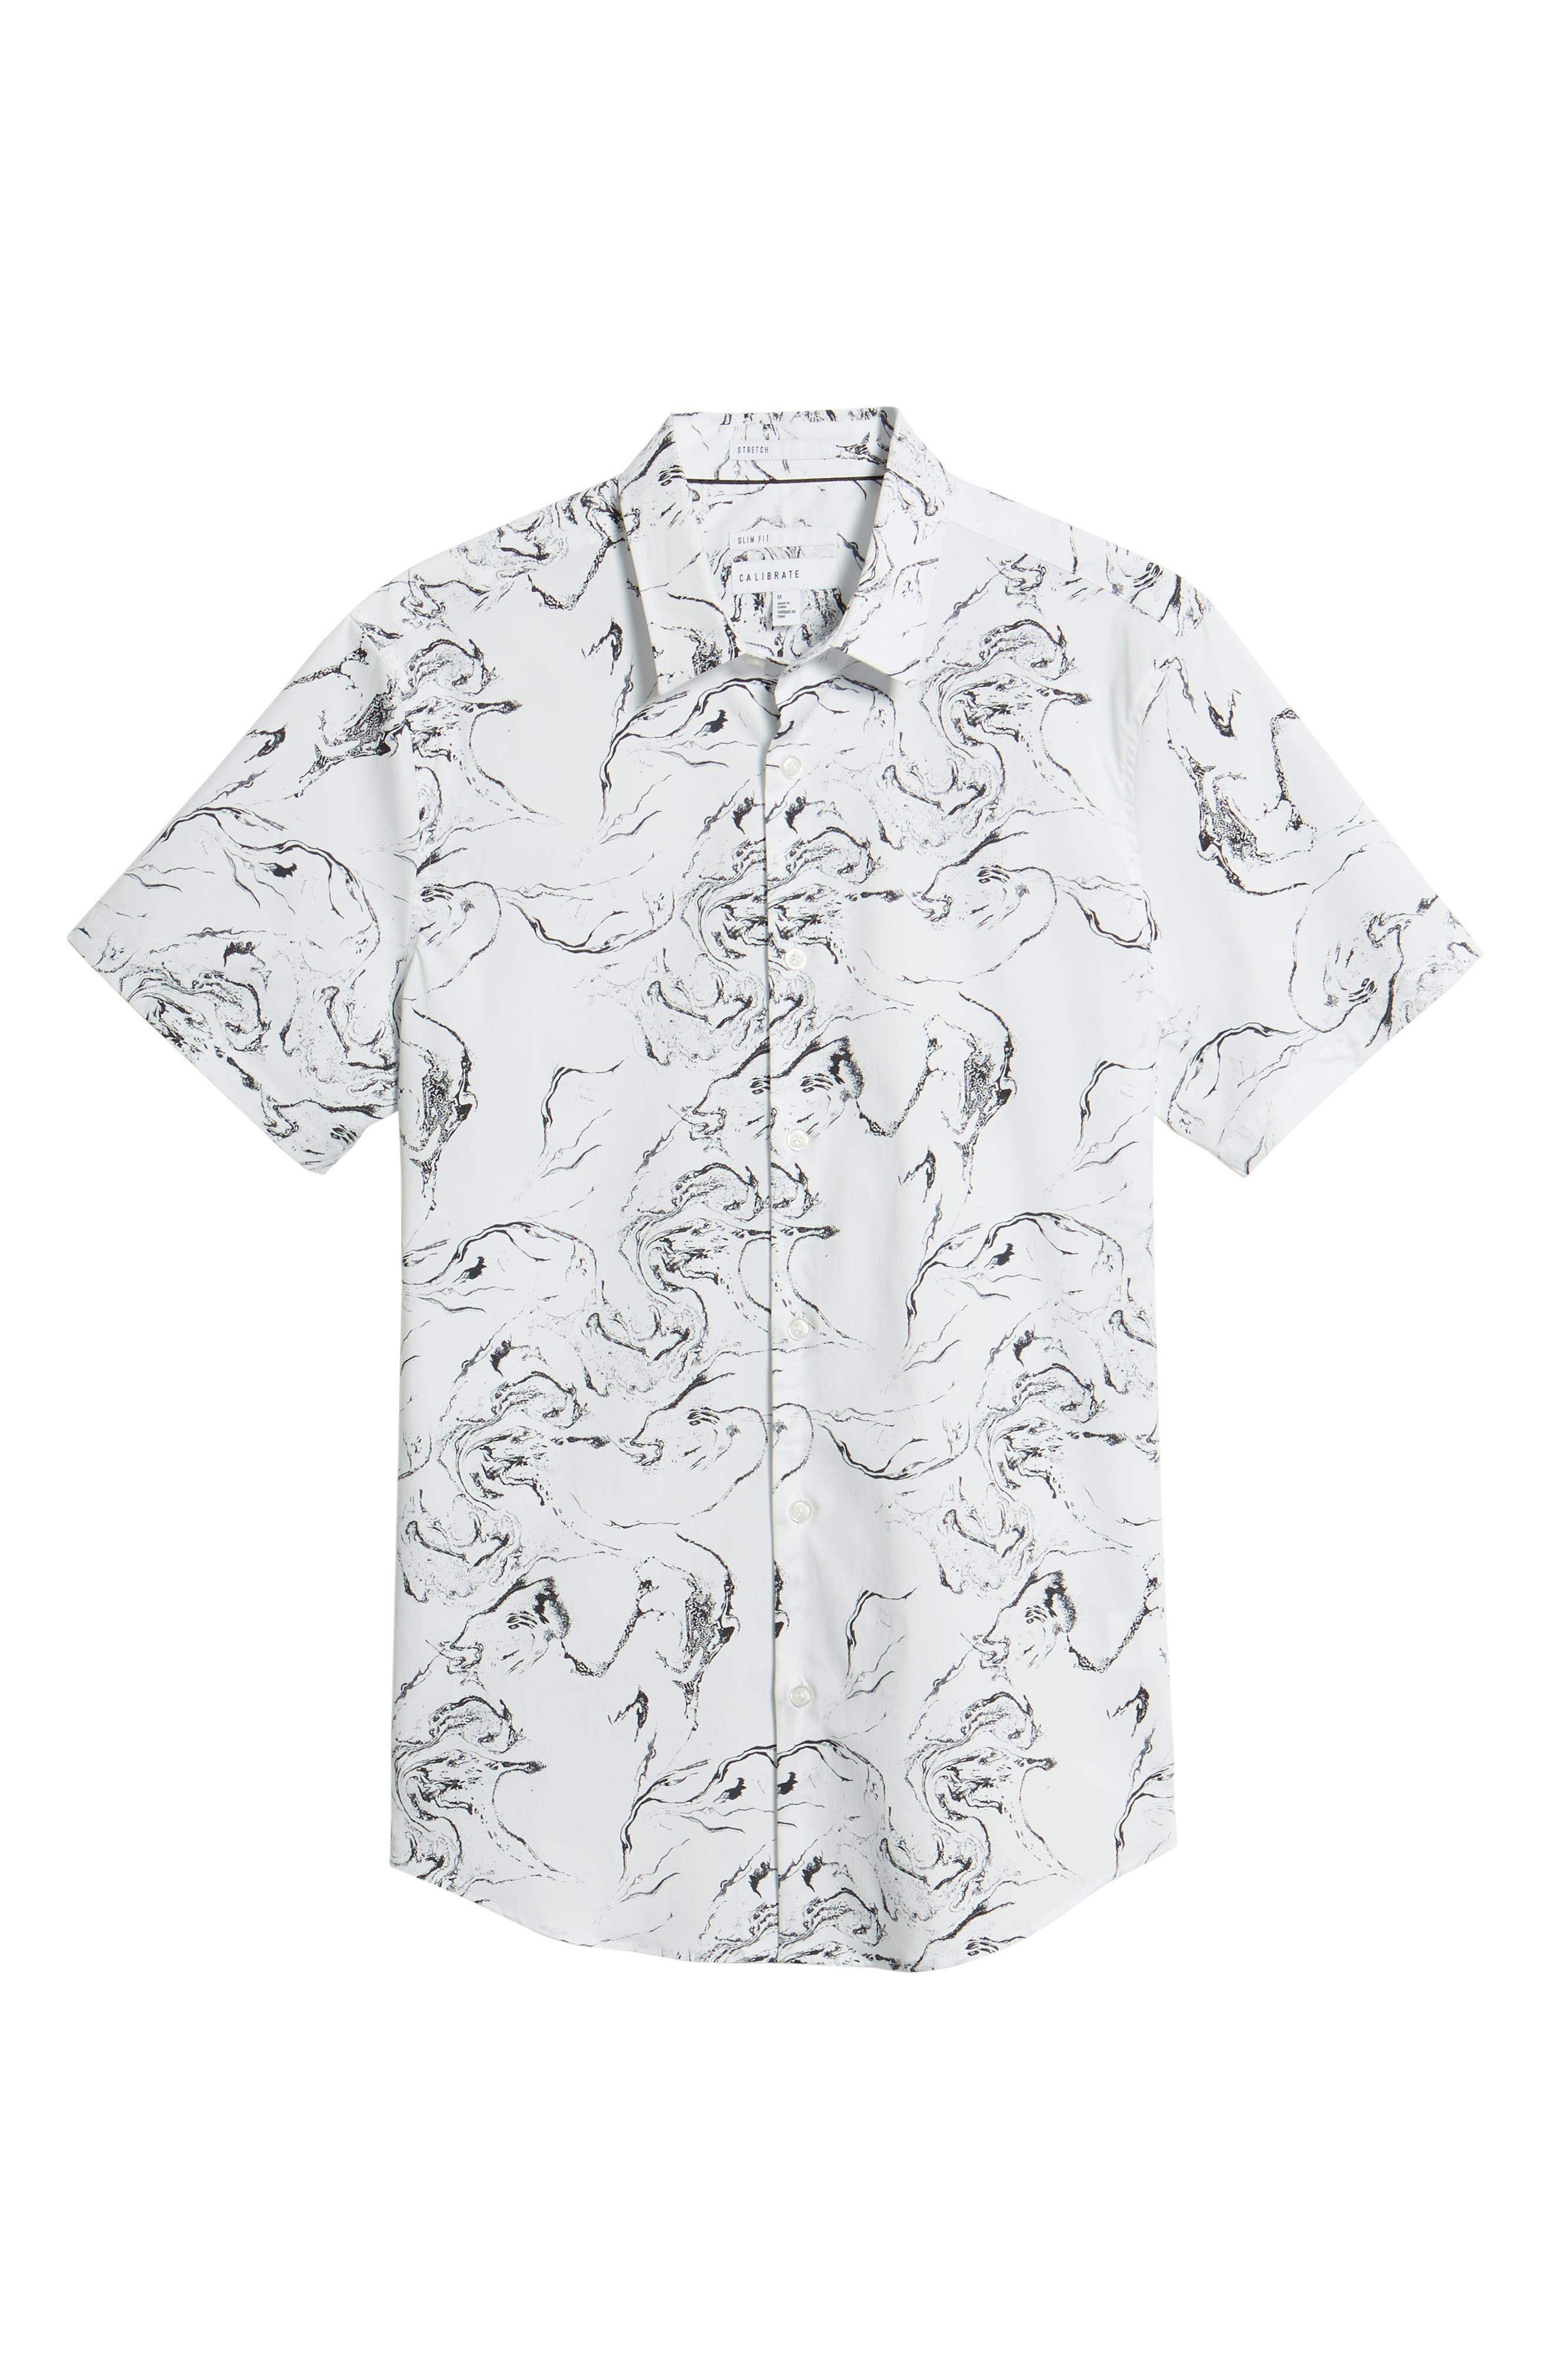 Trim Fit Stretch Print Short Sleeve Sport Shirt,                             Alternate thumbnail 6, color,                             White Marble Print